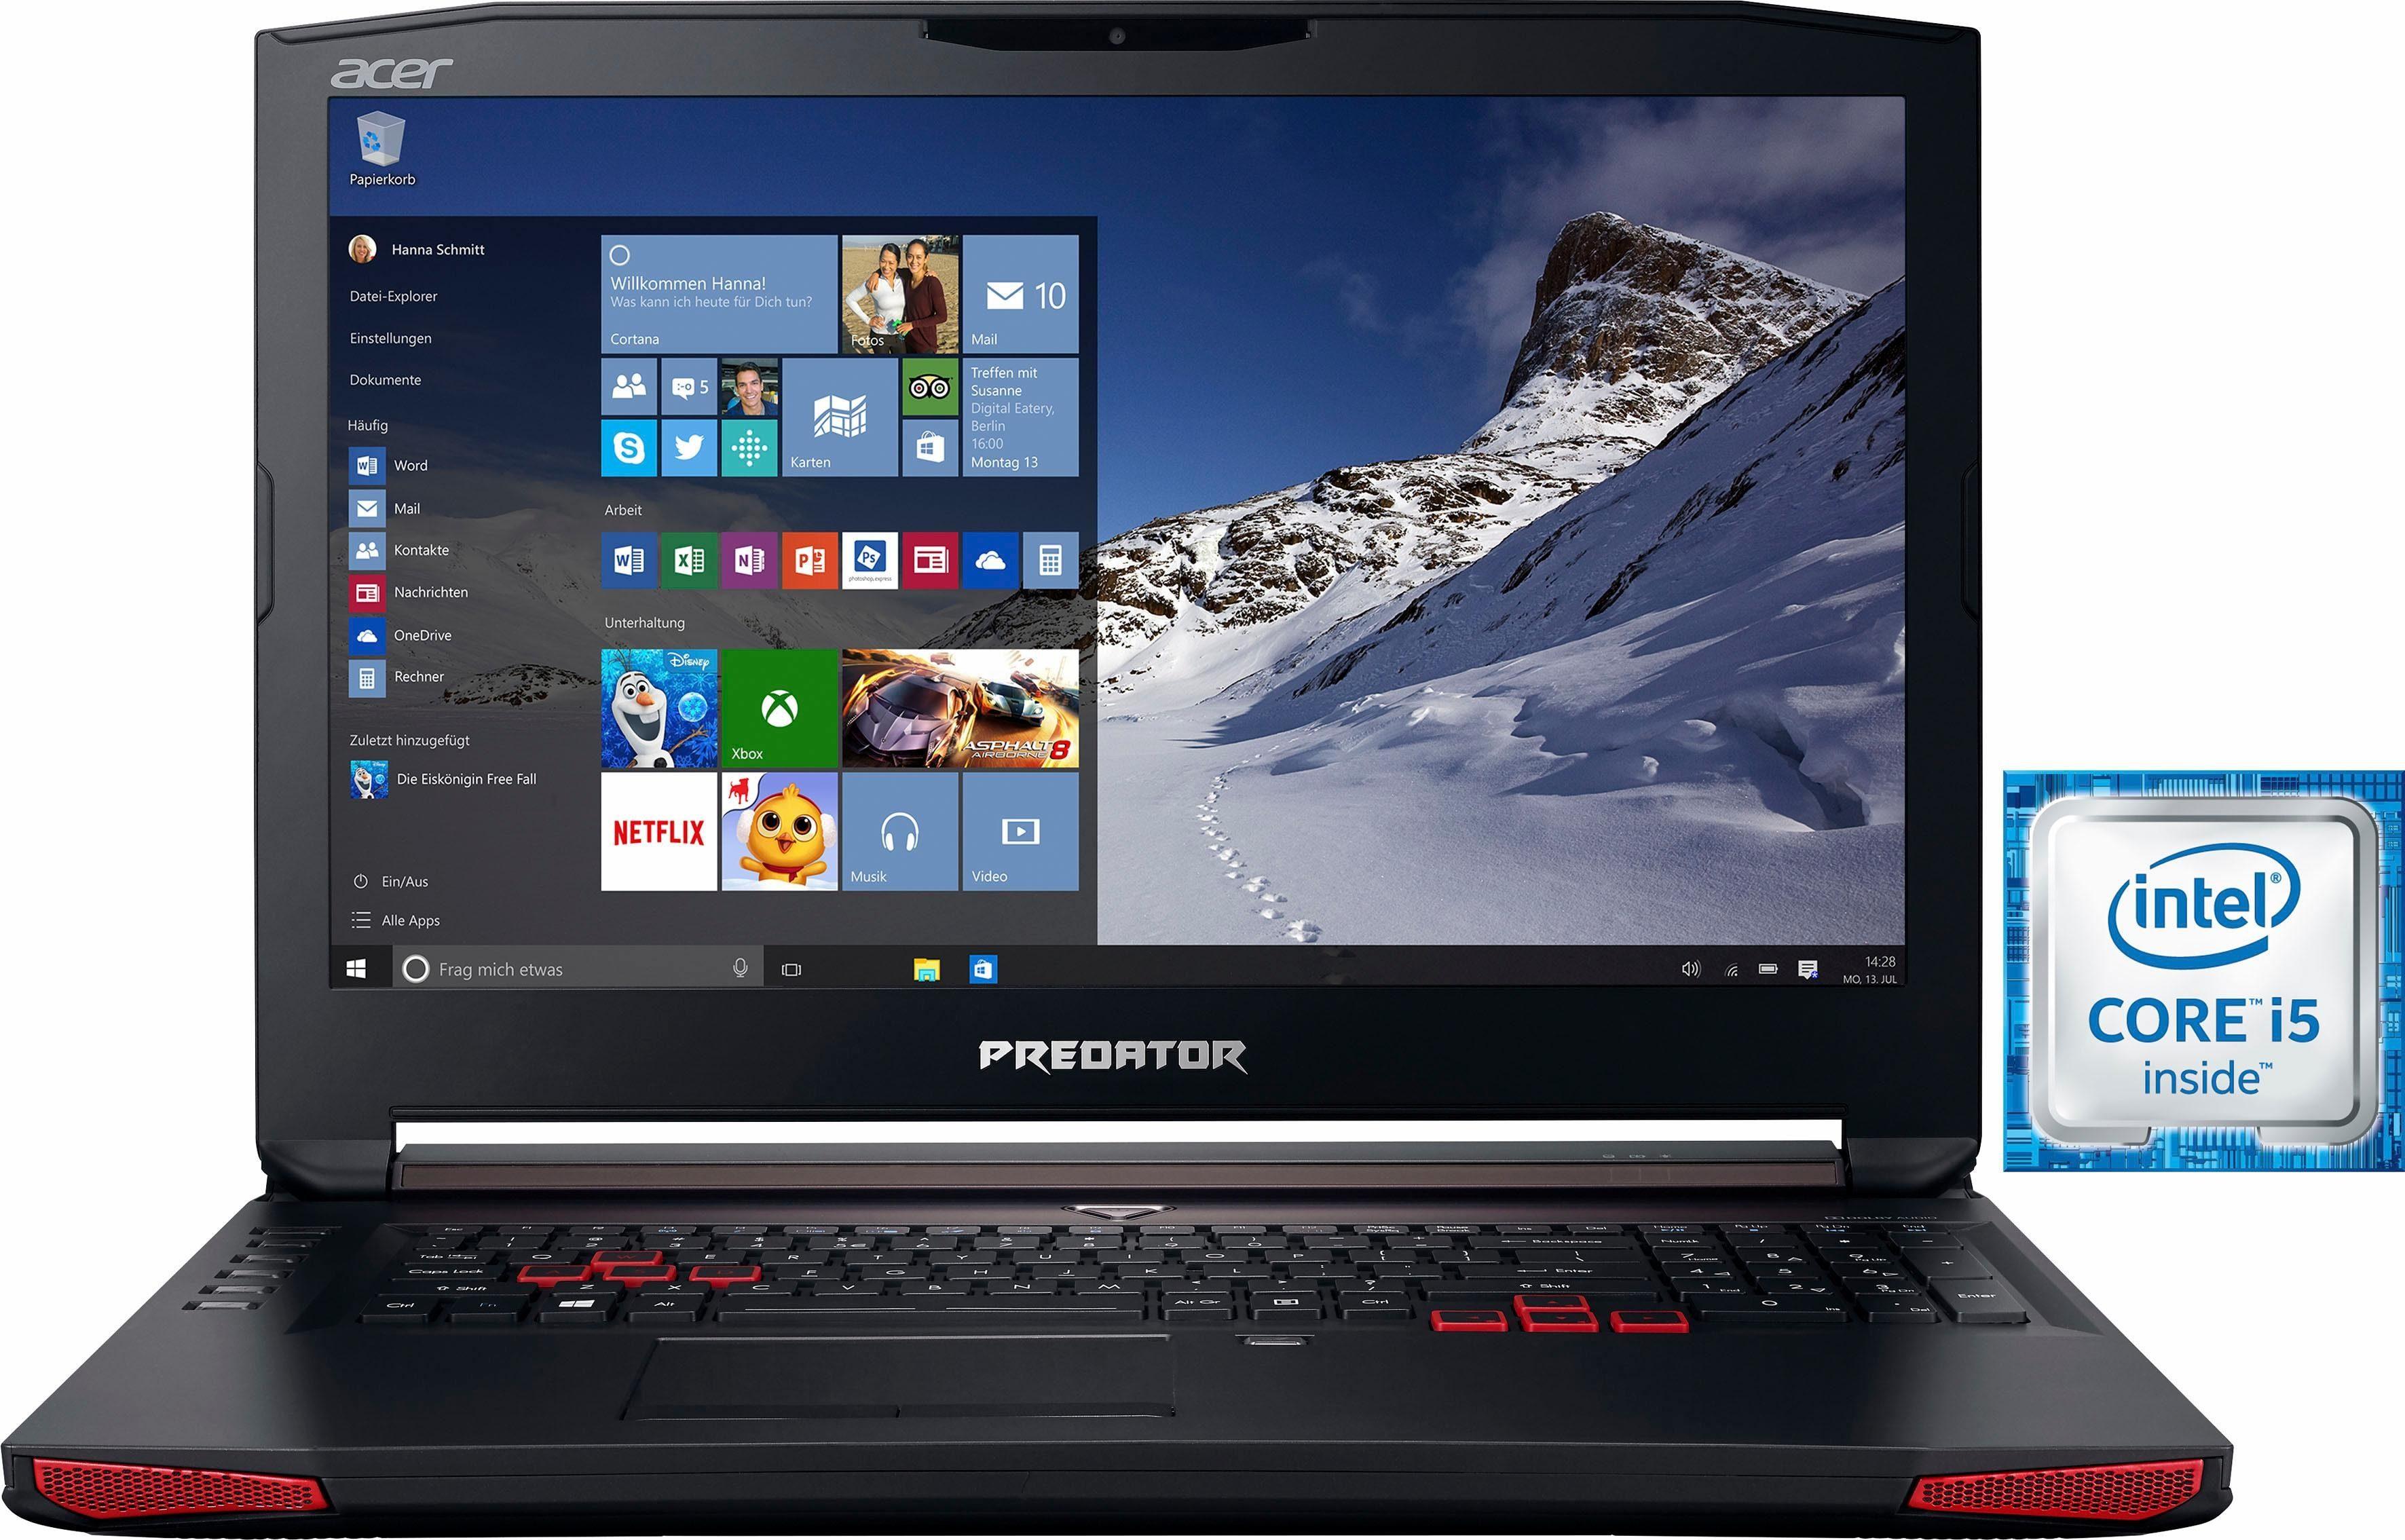 Acer Predator G5-793-53FA Notebook, Intel® Core™ i5, 43,9 cm (17,3 Zoll), 1256 GB Speicher